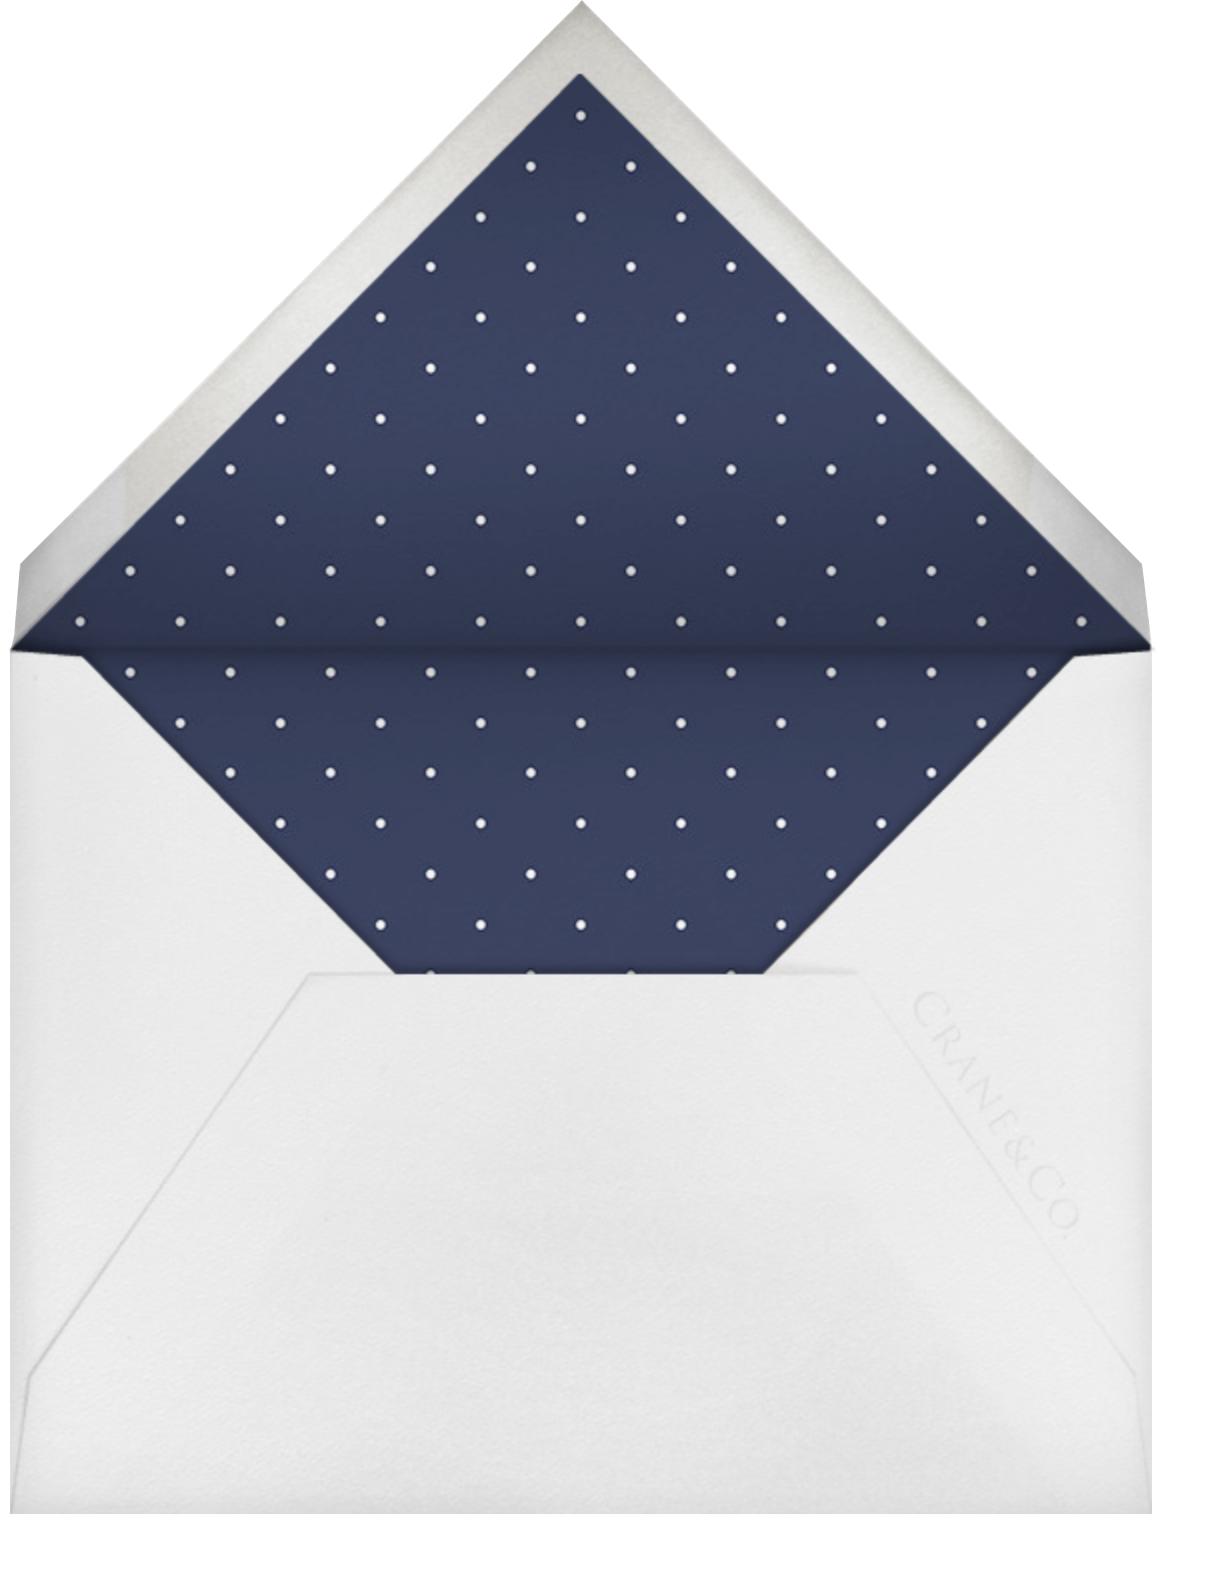 Double Loop Frame I (Invitation) - Gold - Paperless Post - All - envelope back